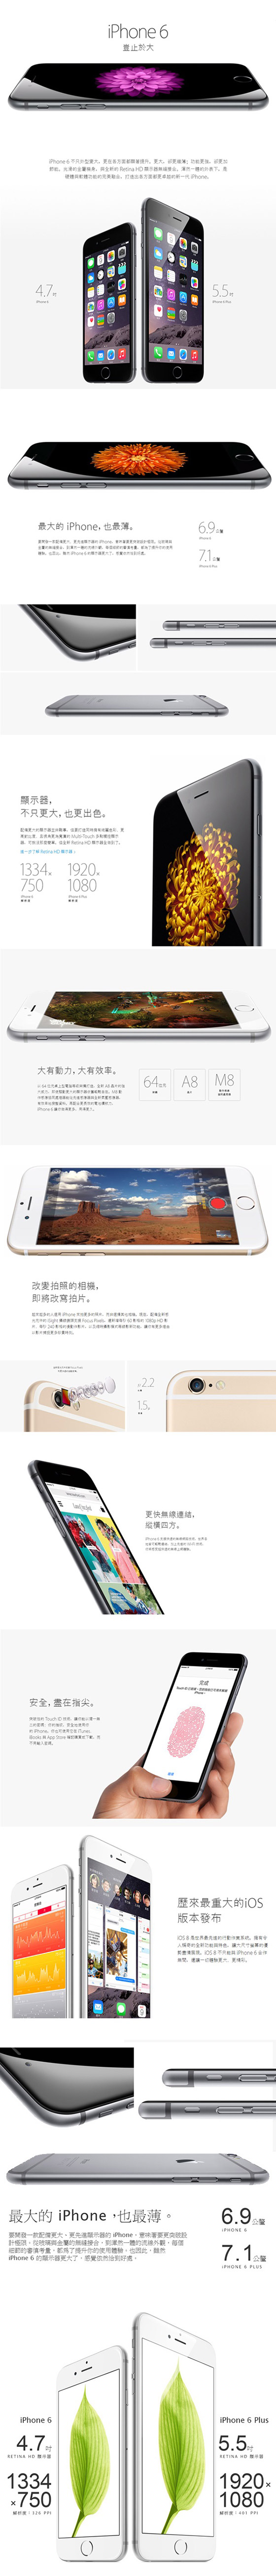 APPLE/ iPhone 6 /4.7吋 /16G/ 灰色/ 9成新 /展示機